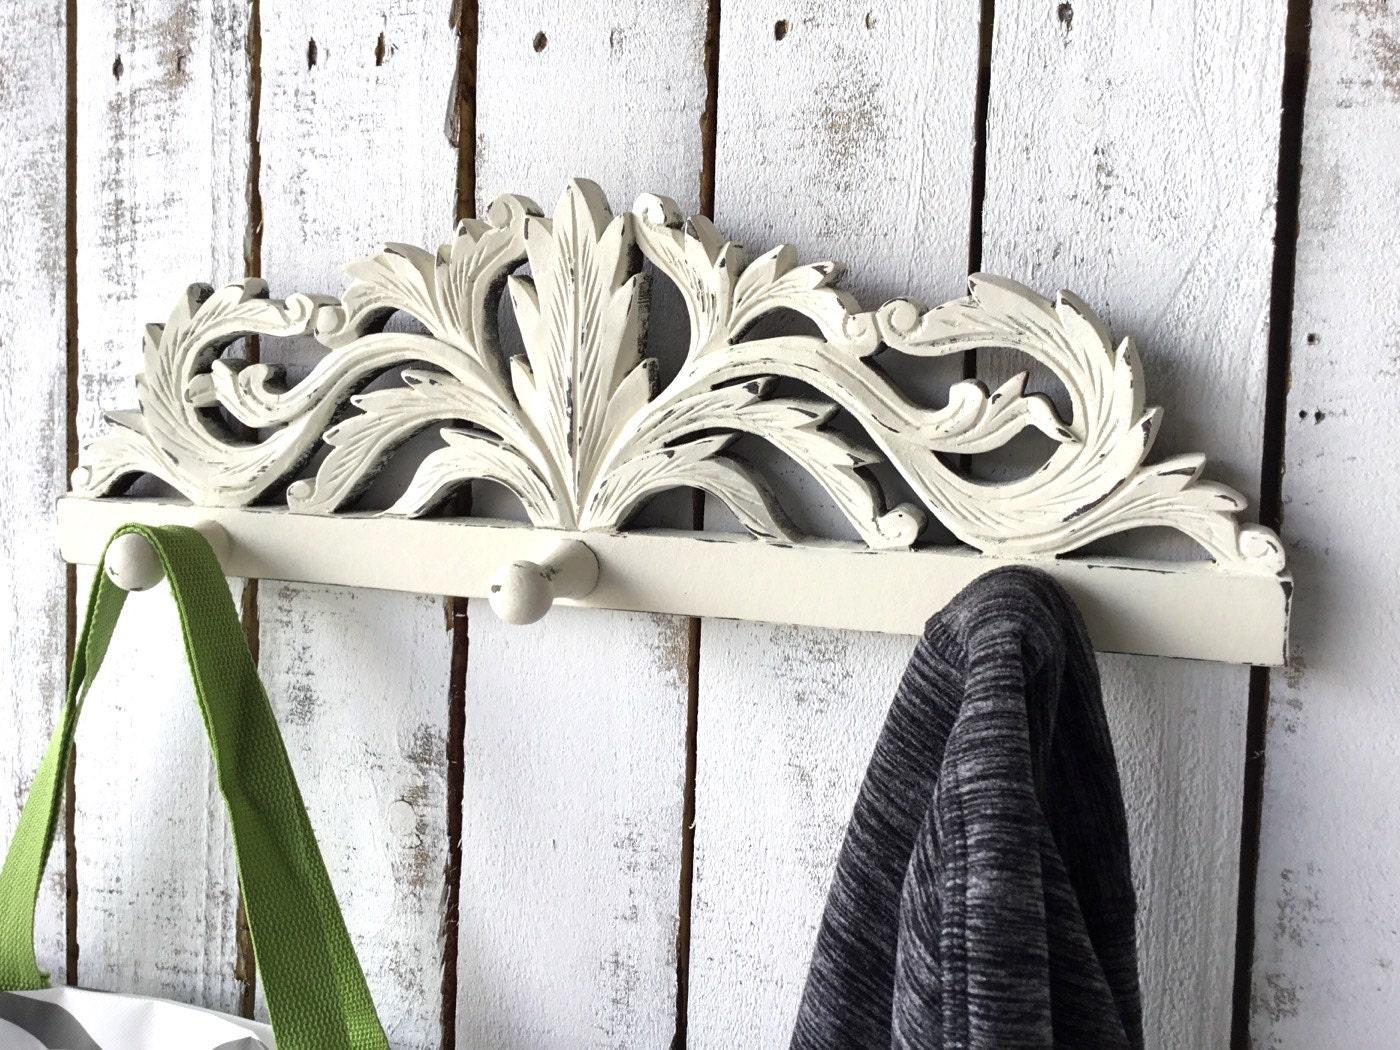 Coat Rack Shabby Chic Wall Rack Decorative Hooks